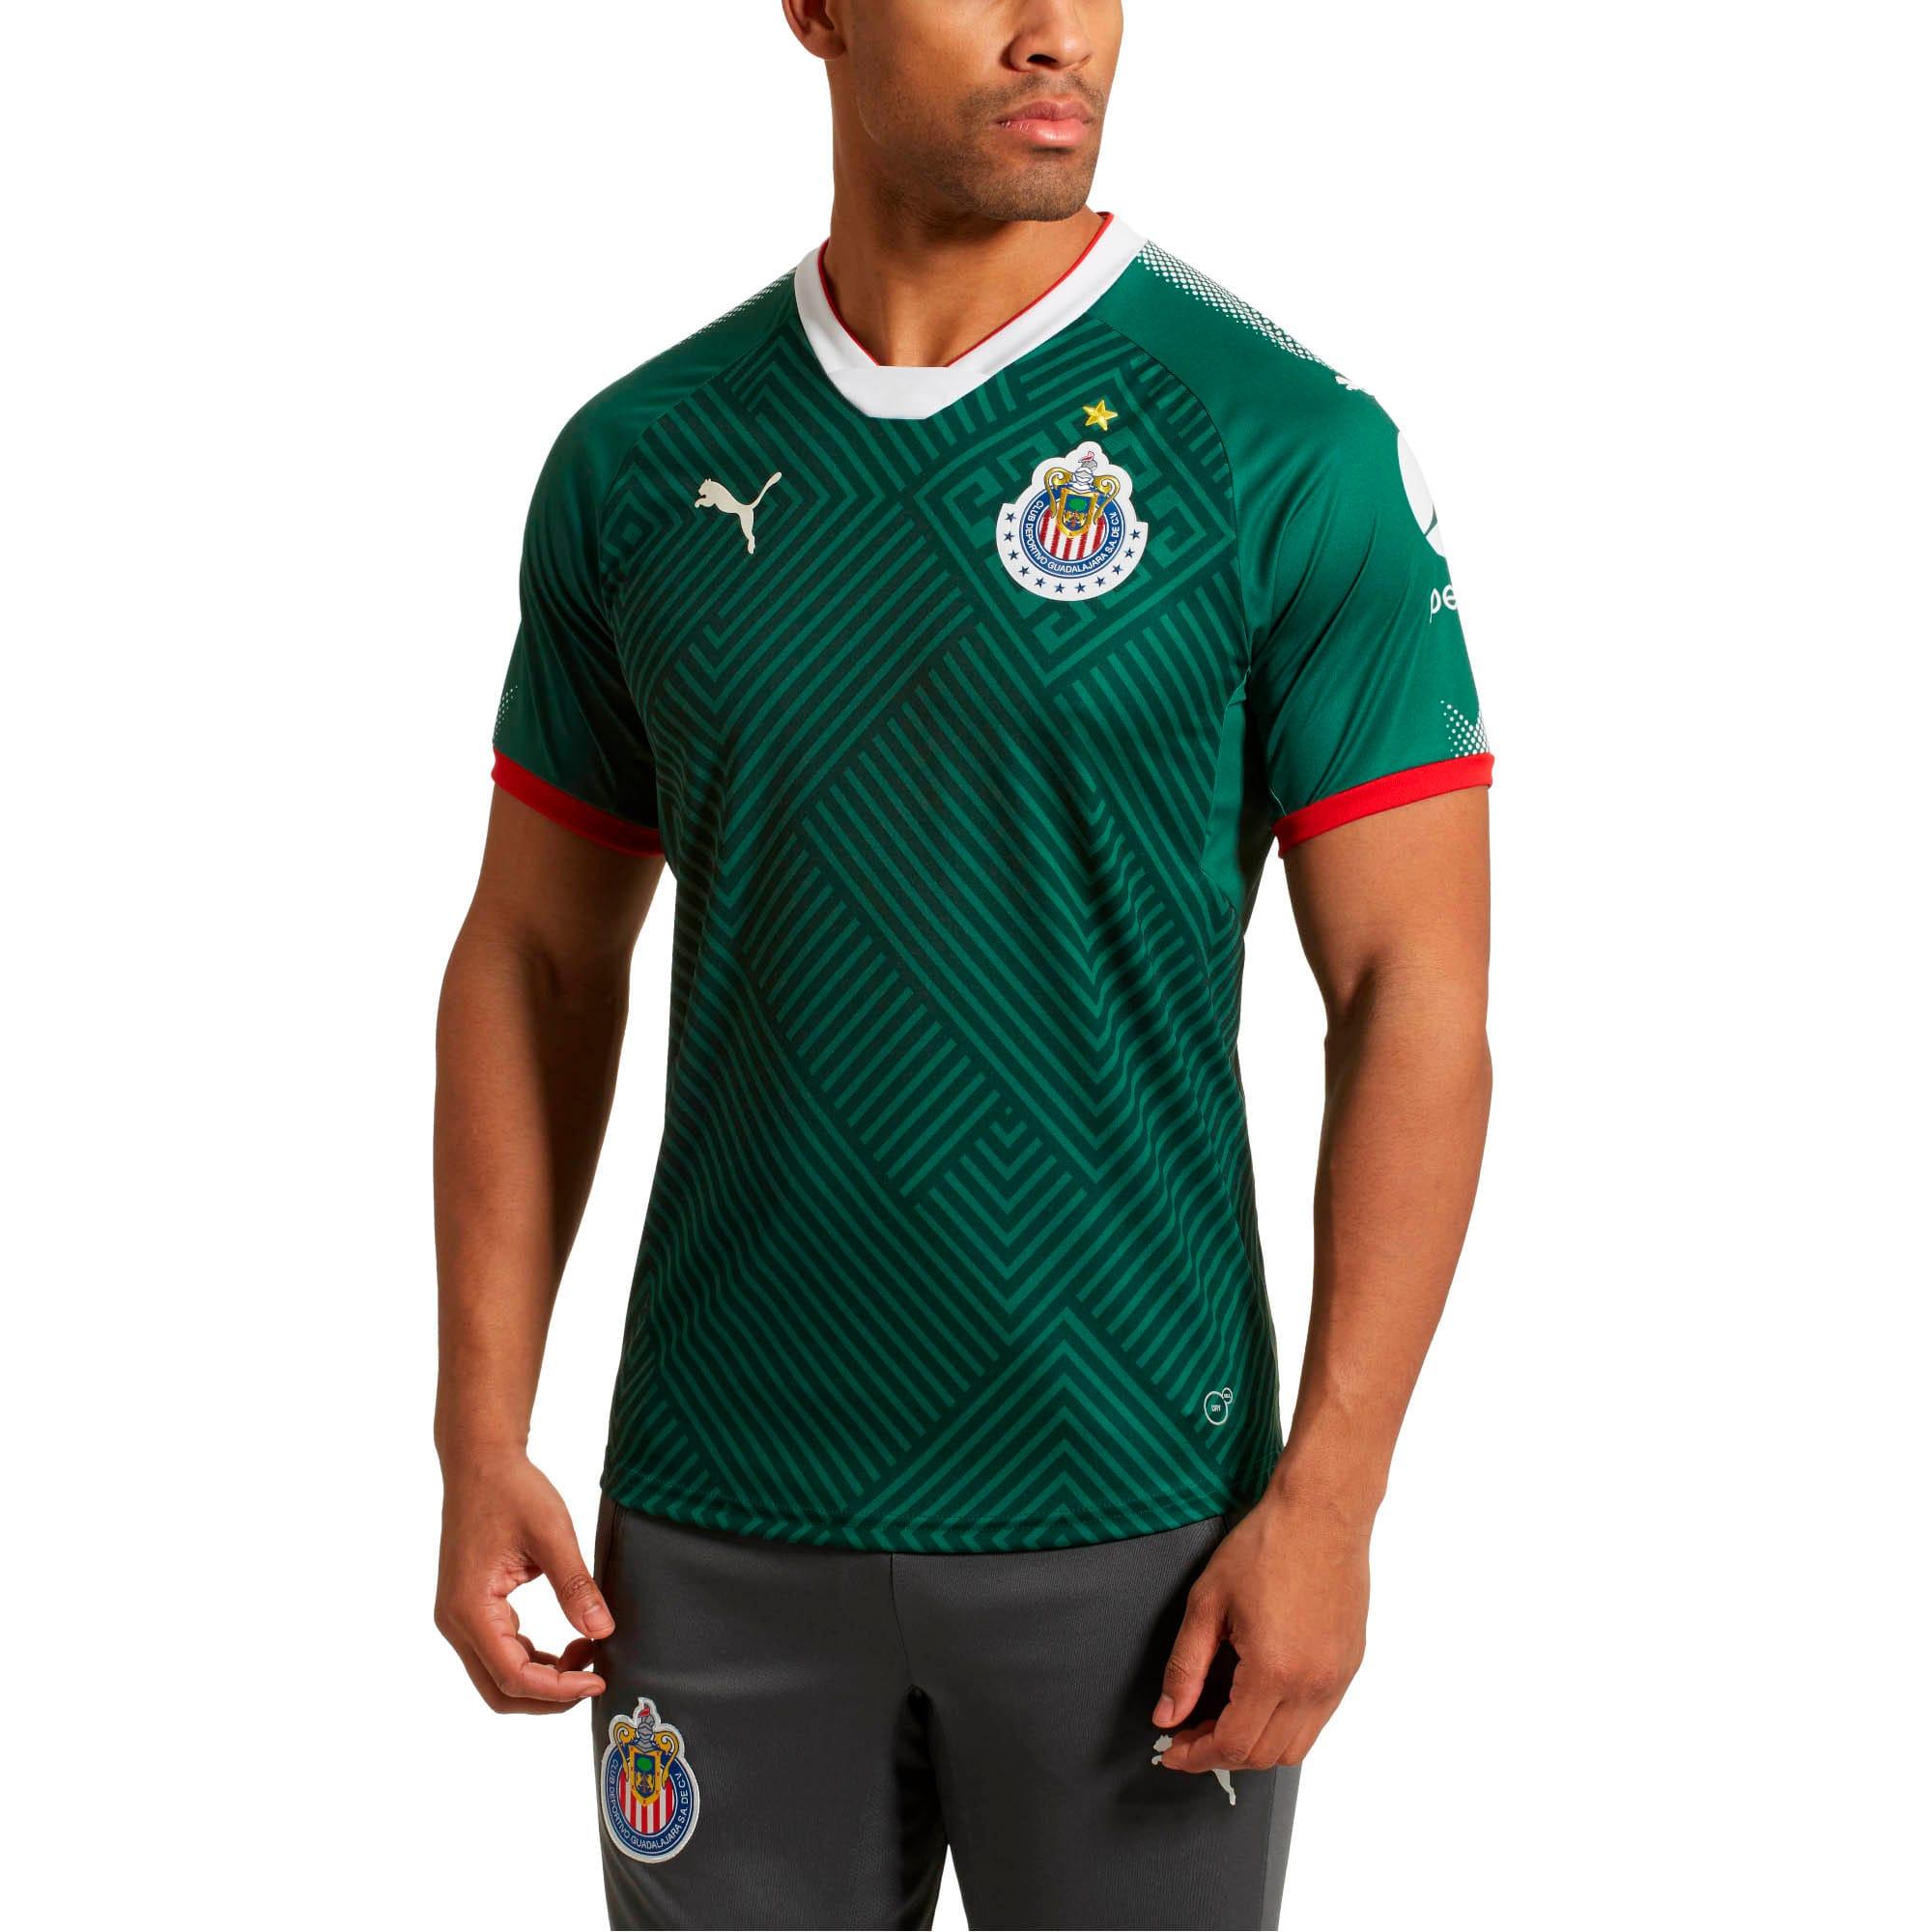 on sale c9888 b00f9 2017/18 Chivas Third Replica Jersey